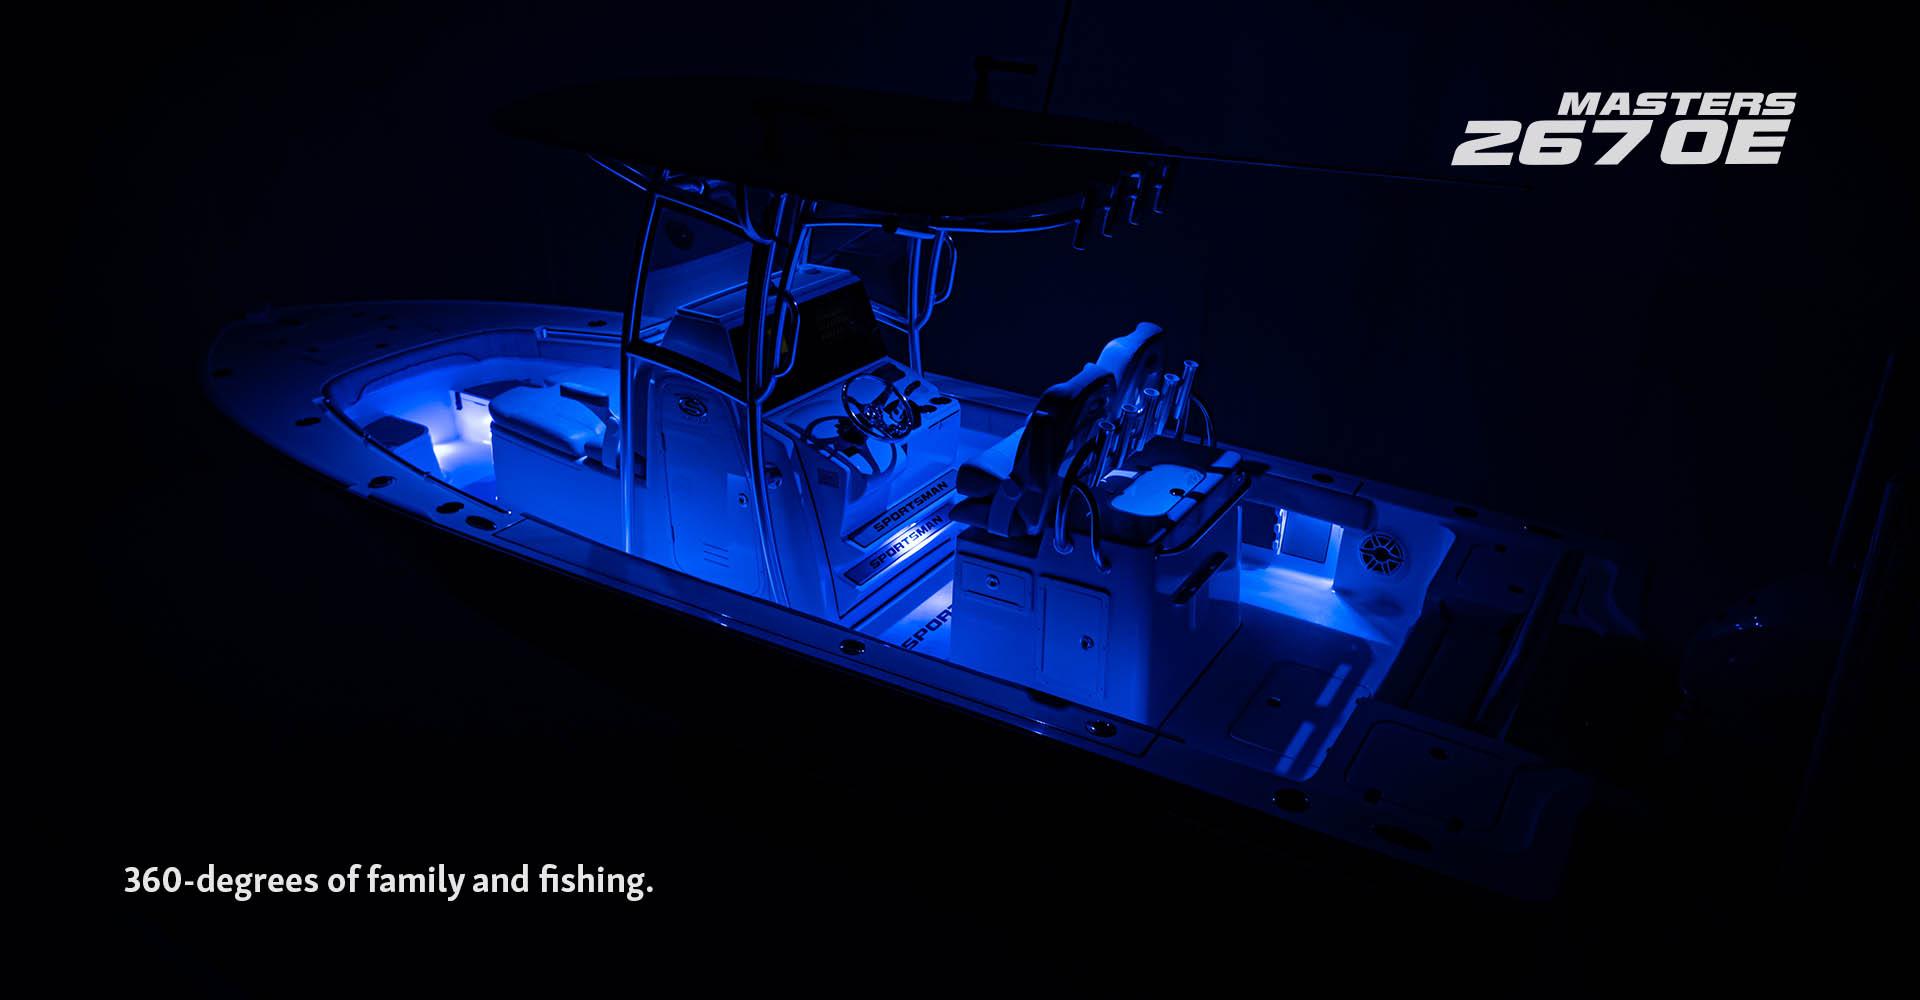 Premier Builder of Center Consoles & Bay Boats | Sportsman Boats